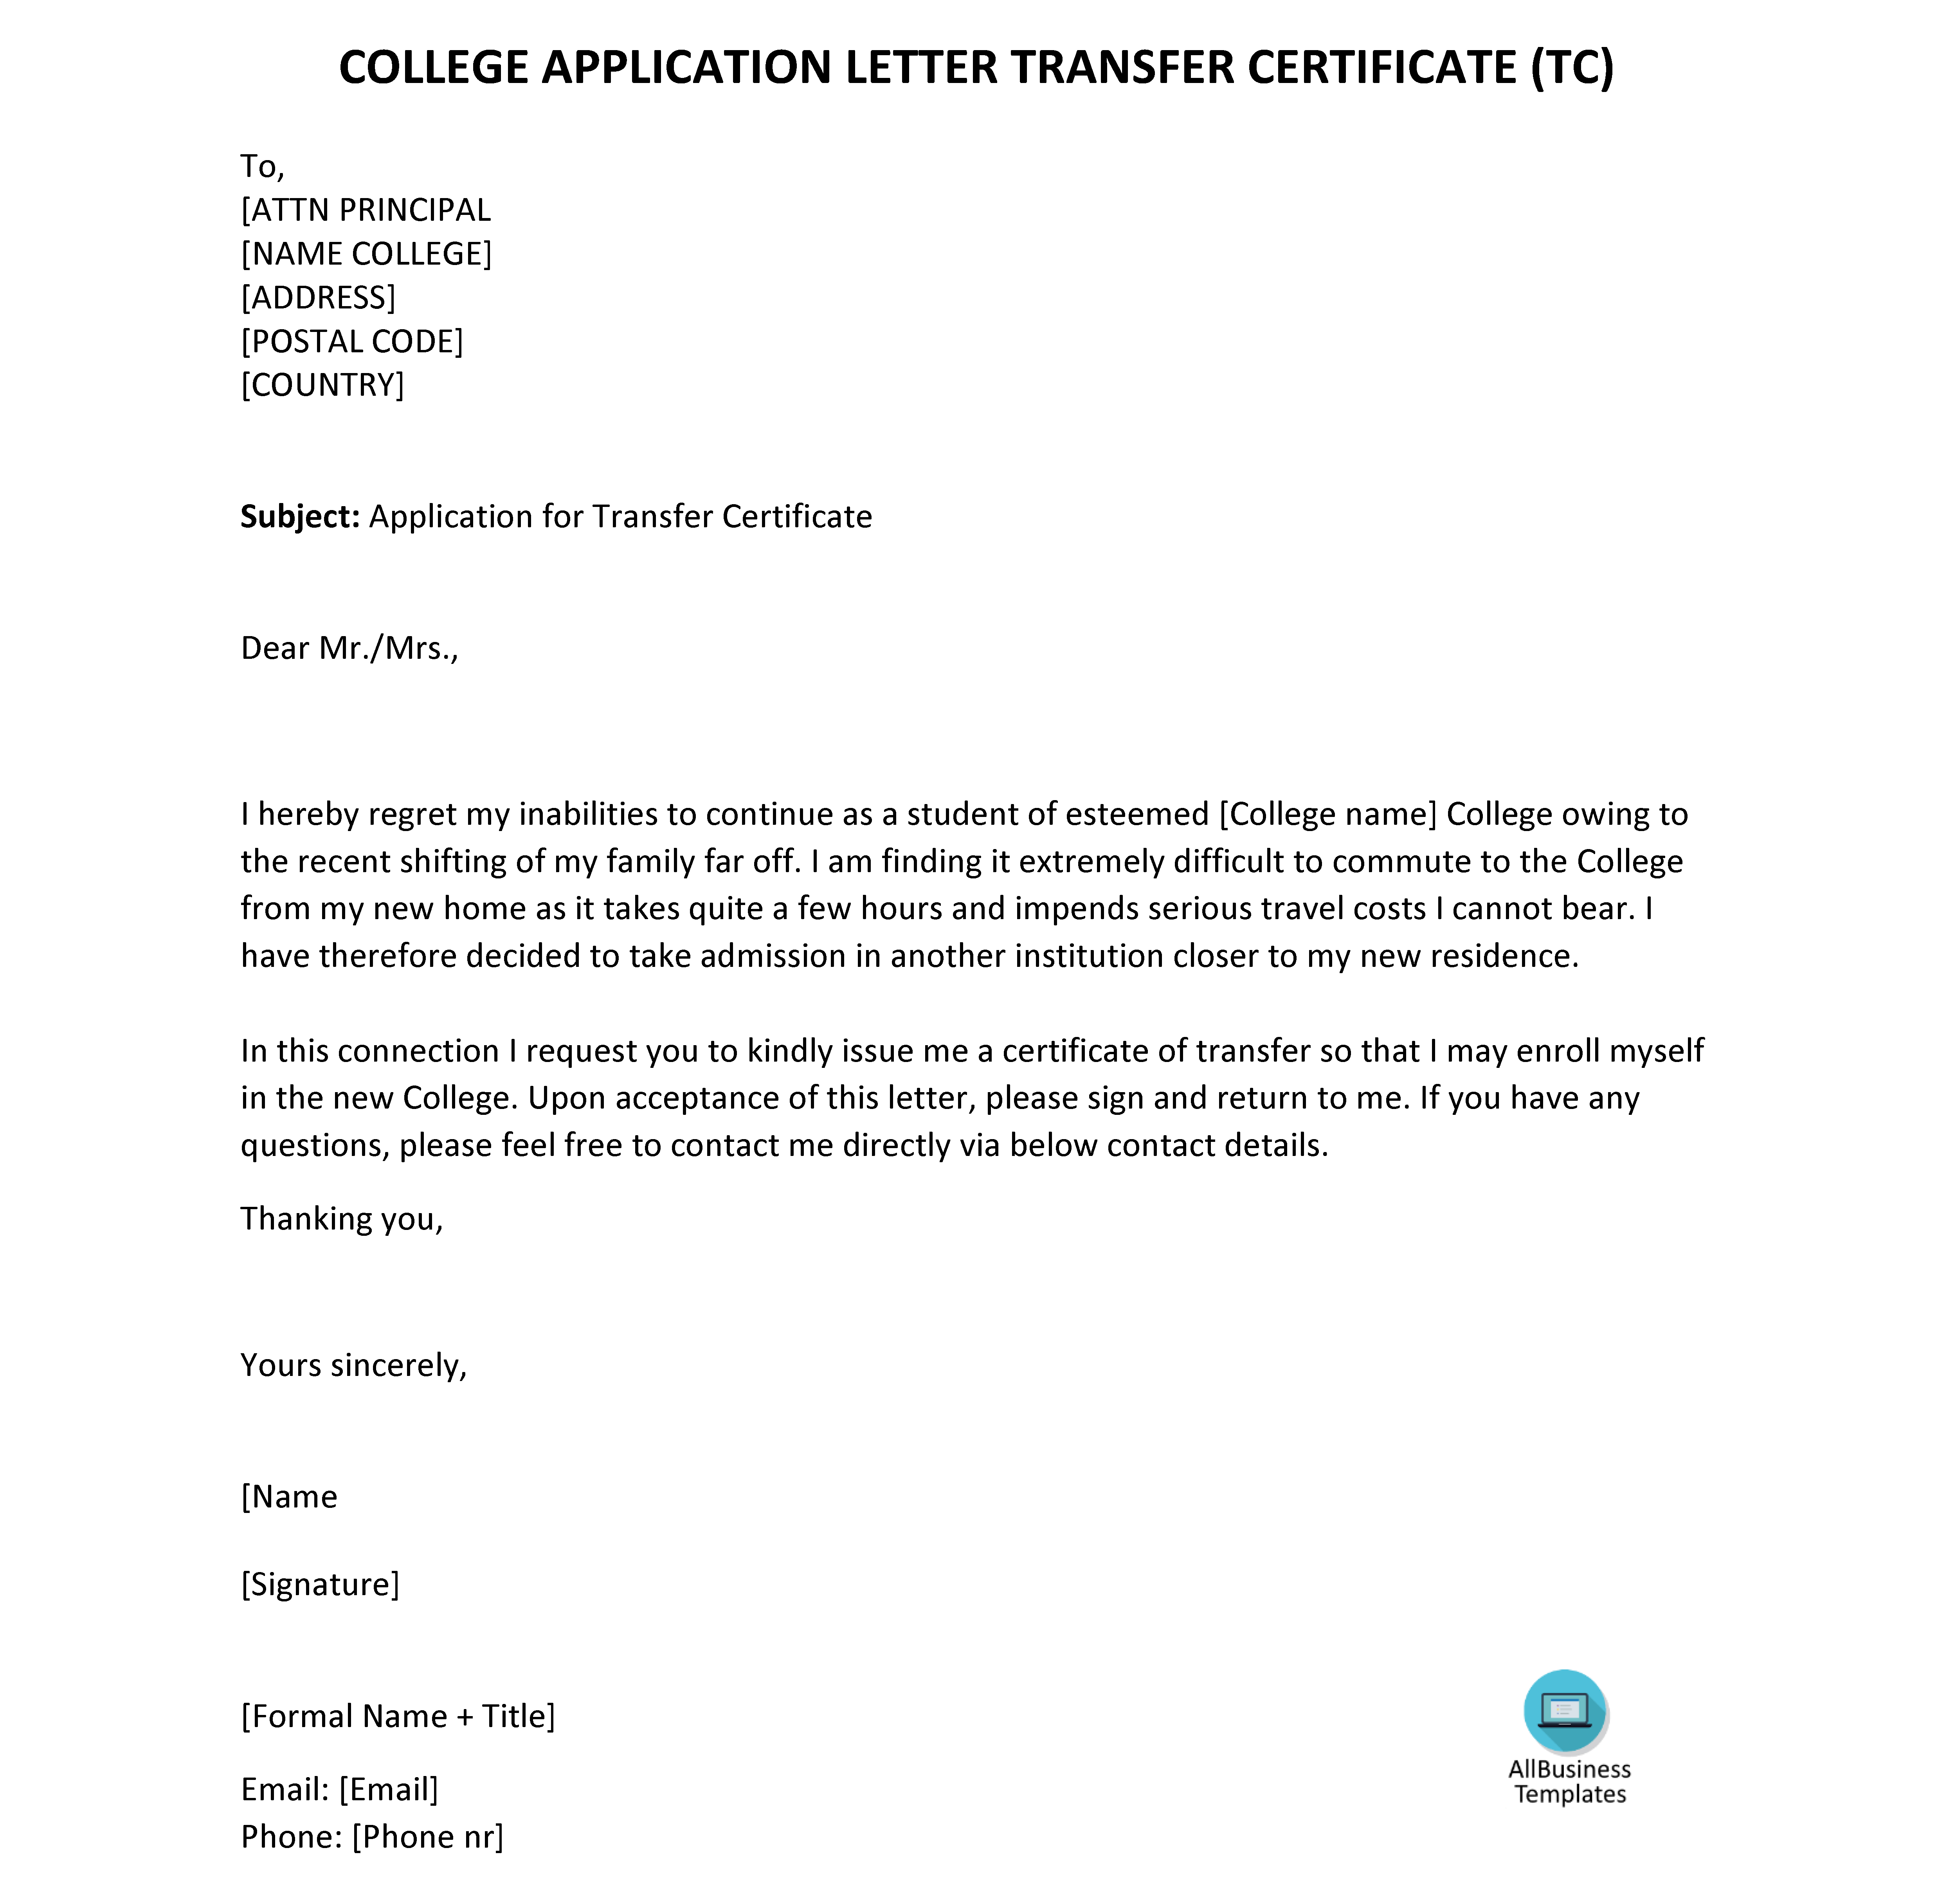 695ccdf25d559293743cf2d8cfaf8c88 - An Application For Transfer Certificate